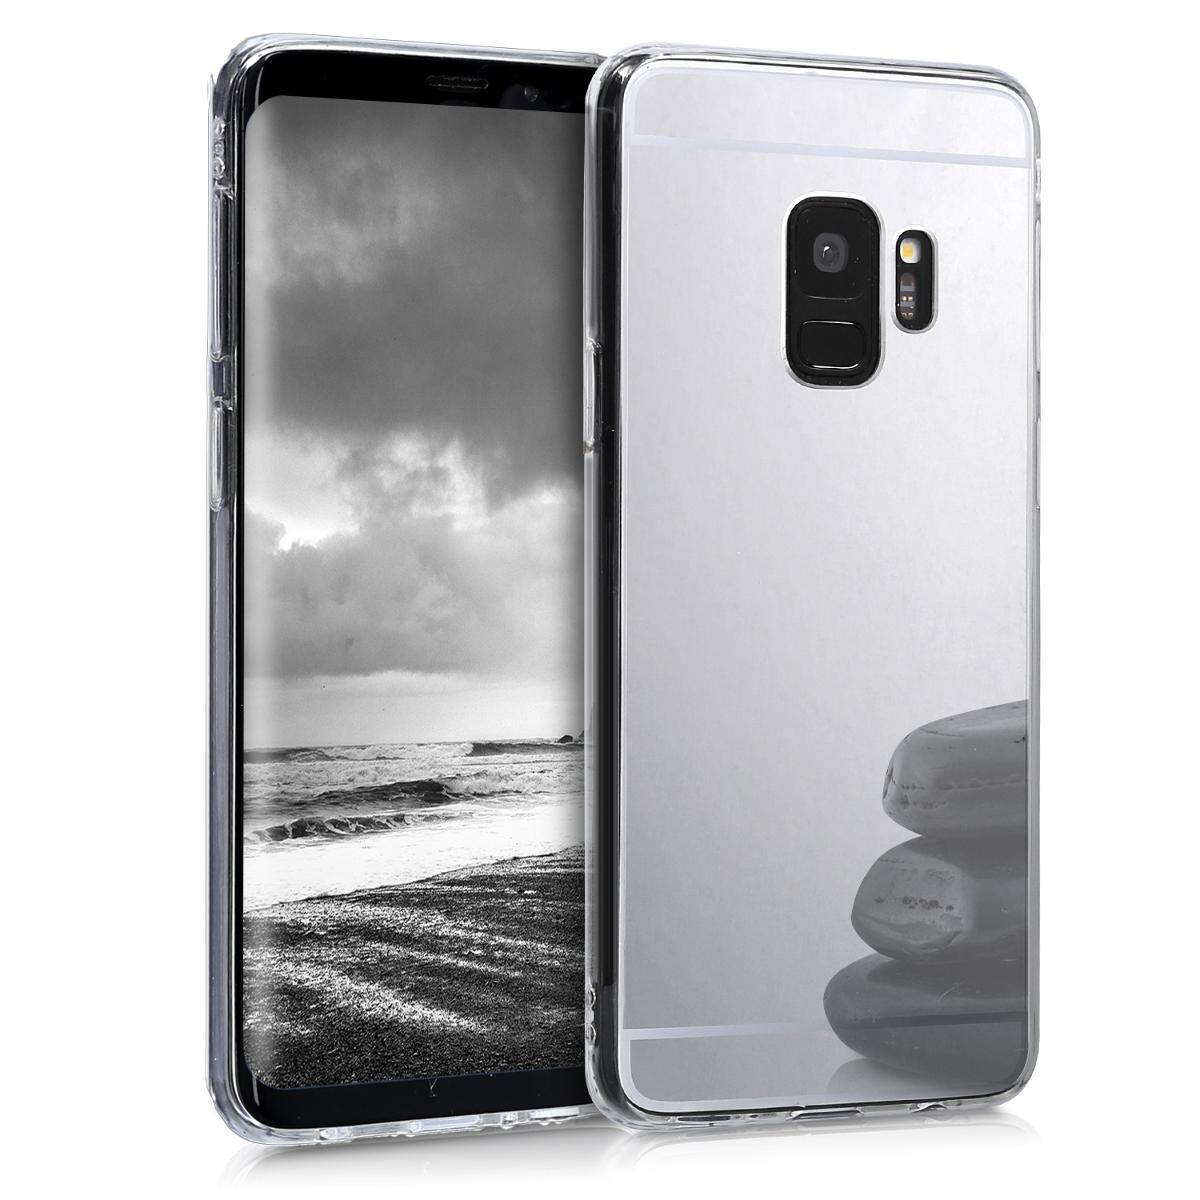 KW Θήκη Σιλικόνης (TPU) με Καθρέφτη Samsung Galaxy S9 - Silver Reflective (44280.42)